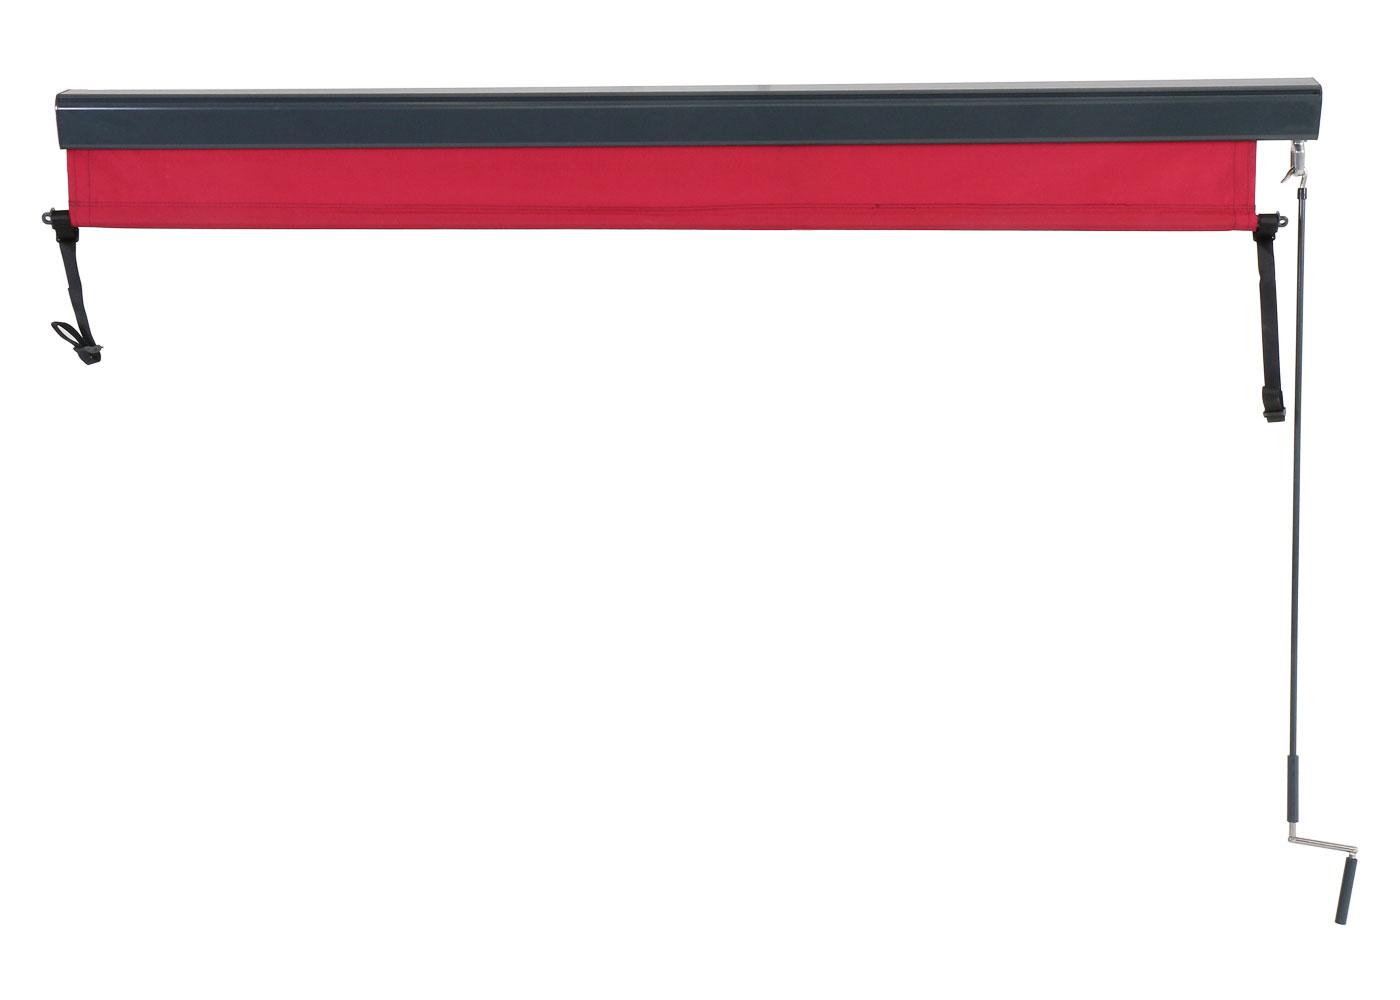 Vertikalmarkise HWC-F42 Hochgekurbelt